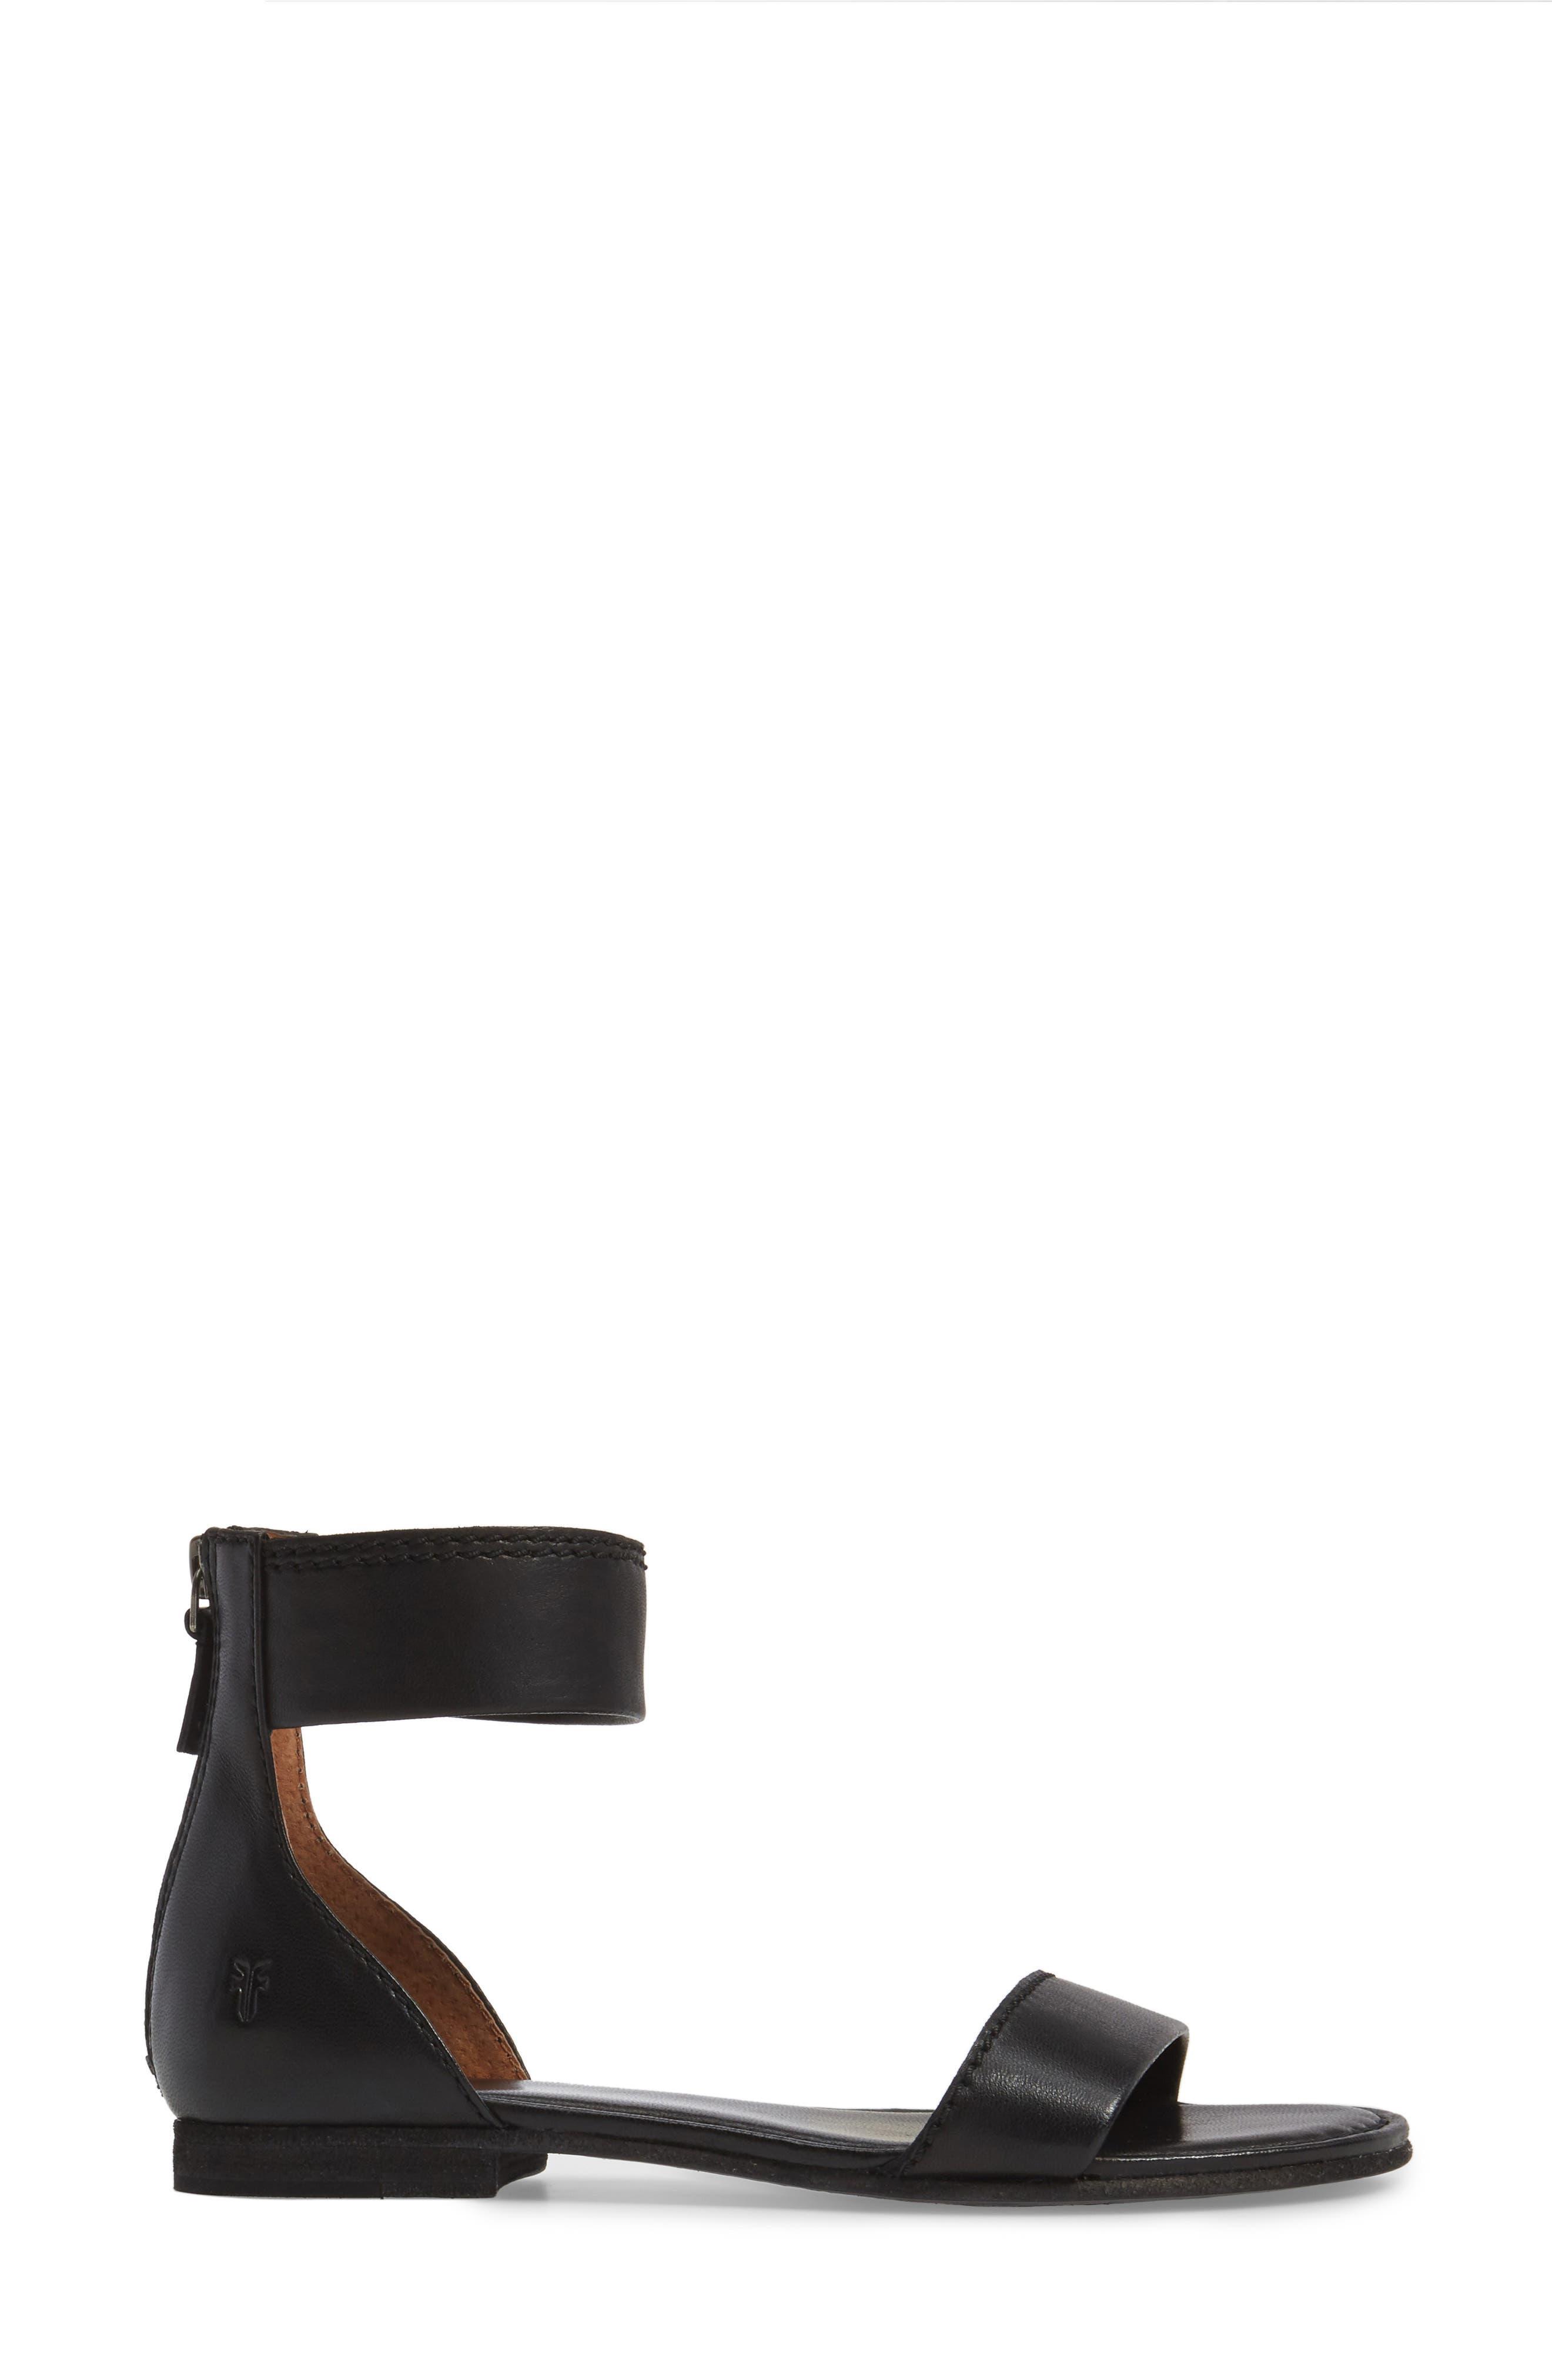 Carson Ankle Strap Sandal,                             Alternate thumbnail 3, color,                             001